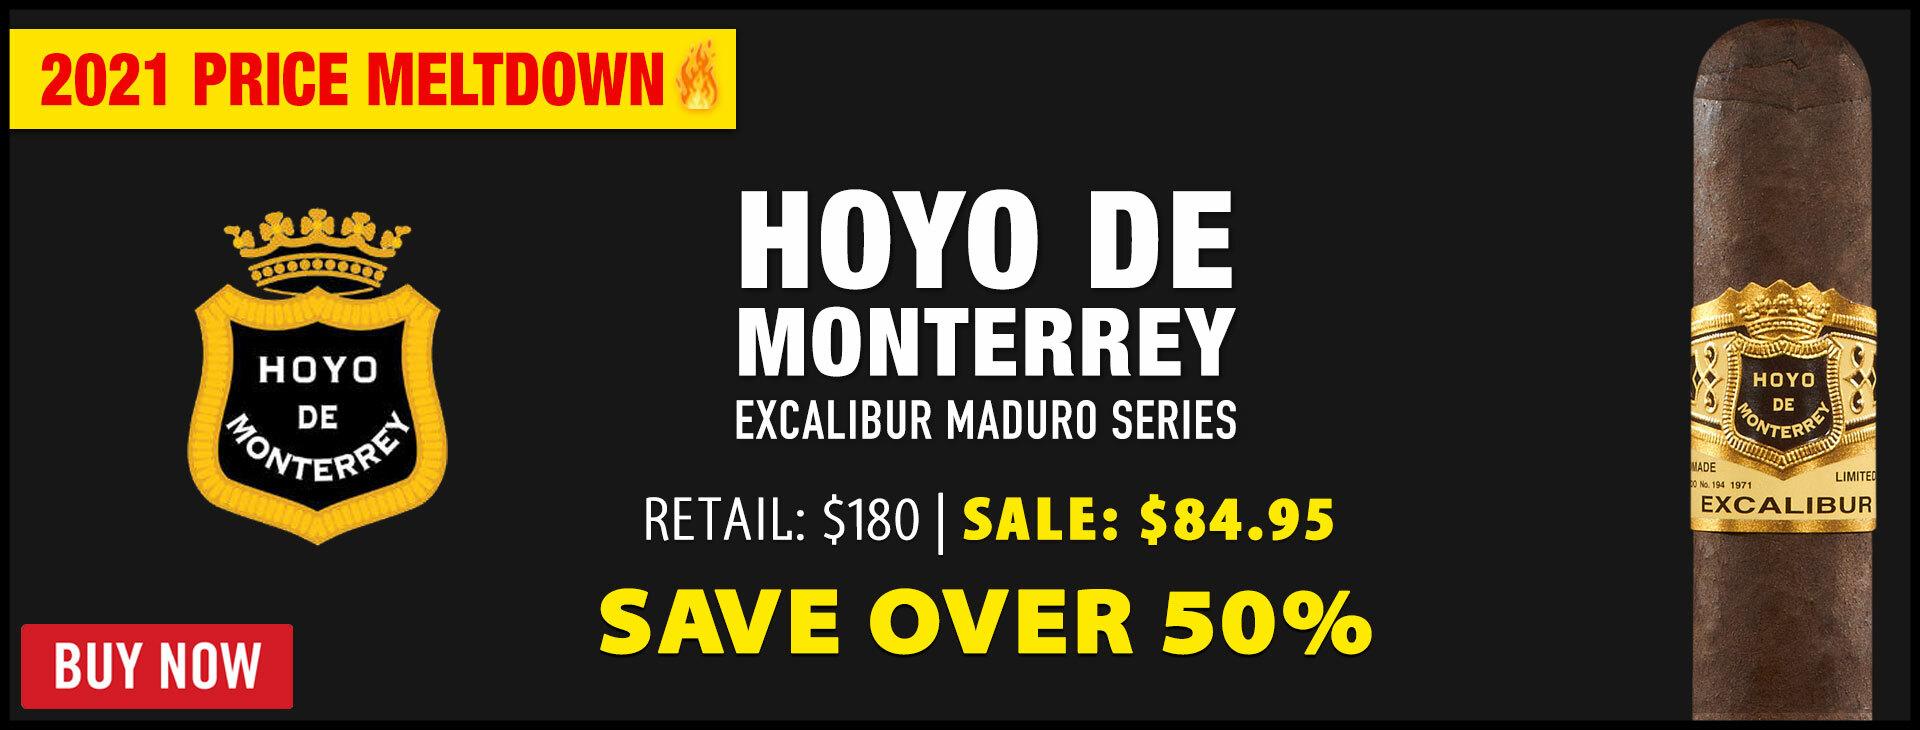 50% OFF Hoyo Excalibur Maduro!